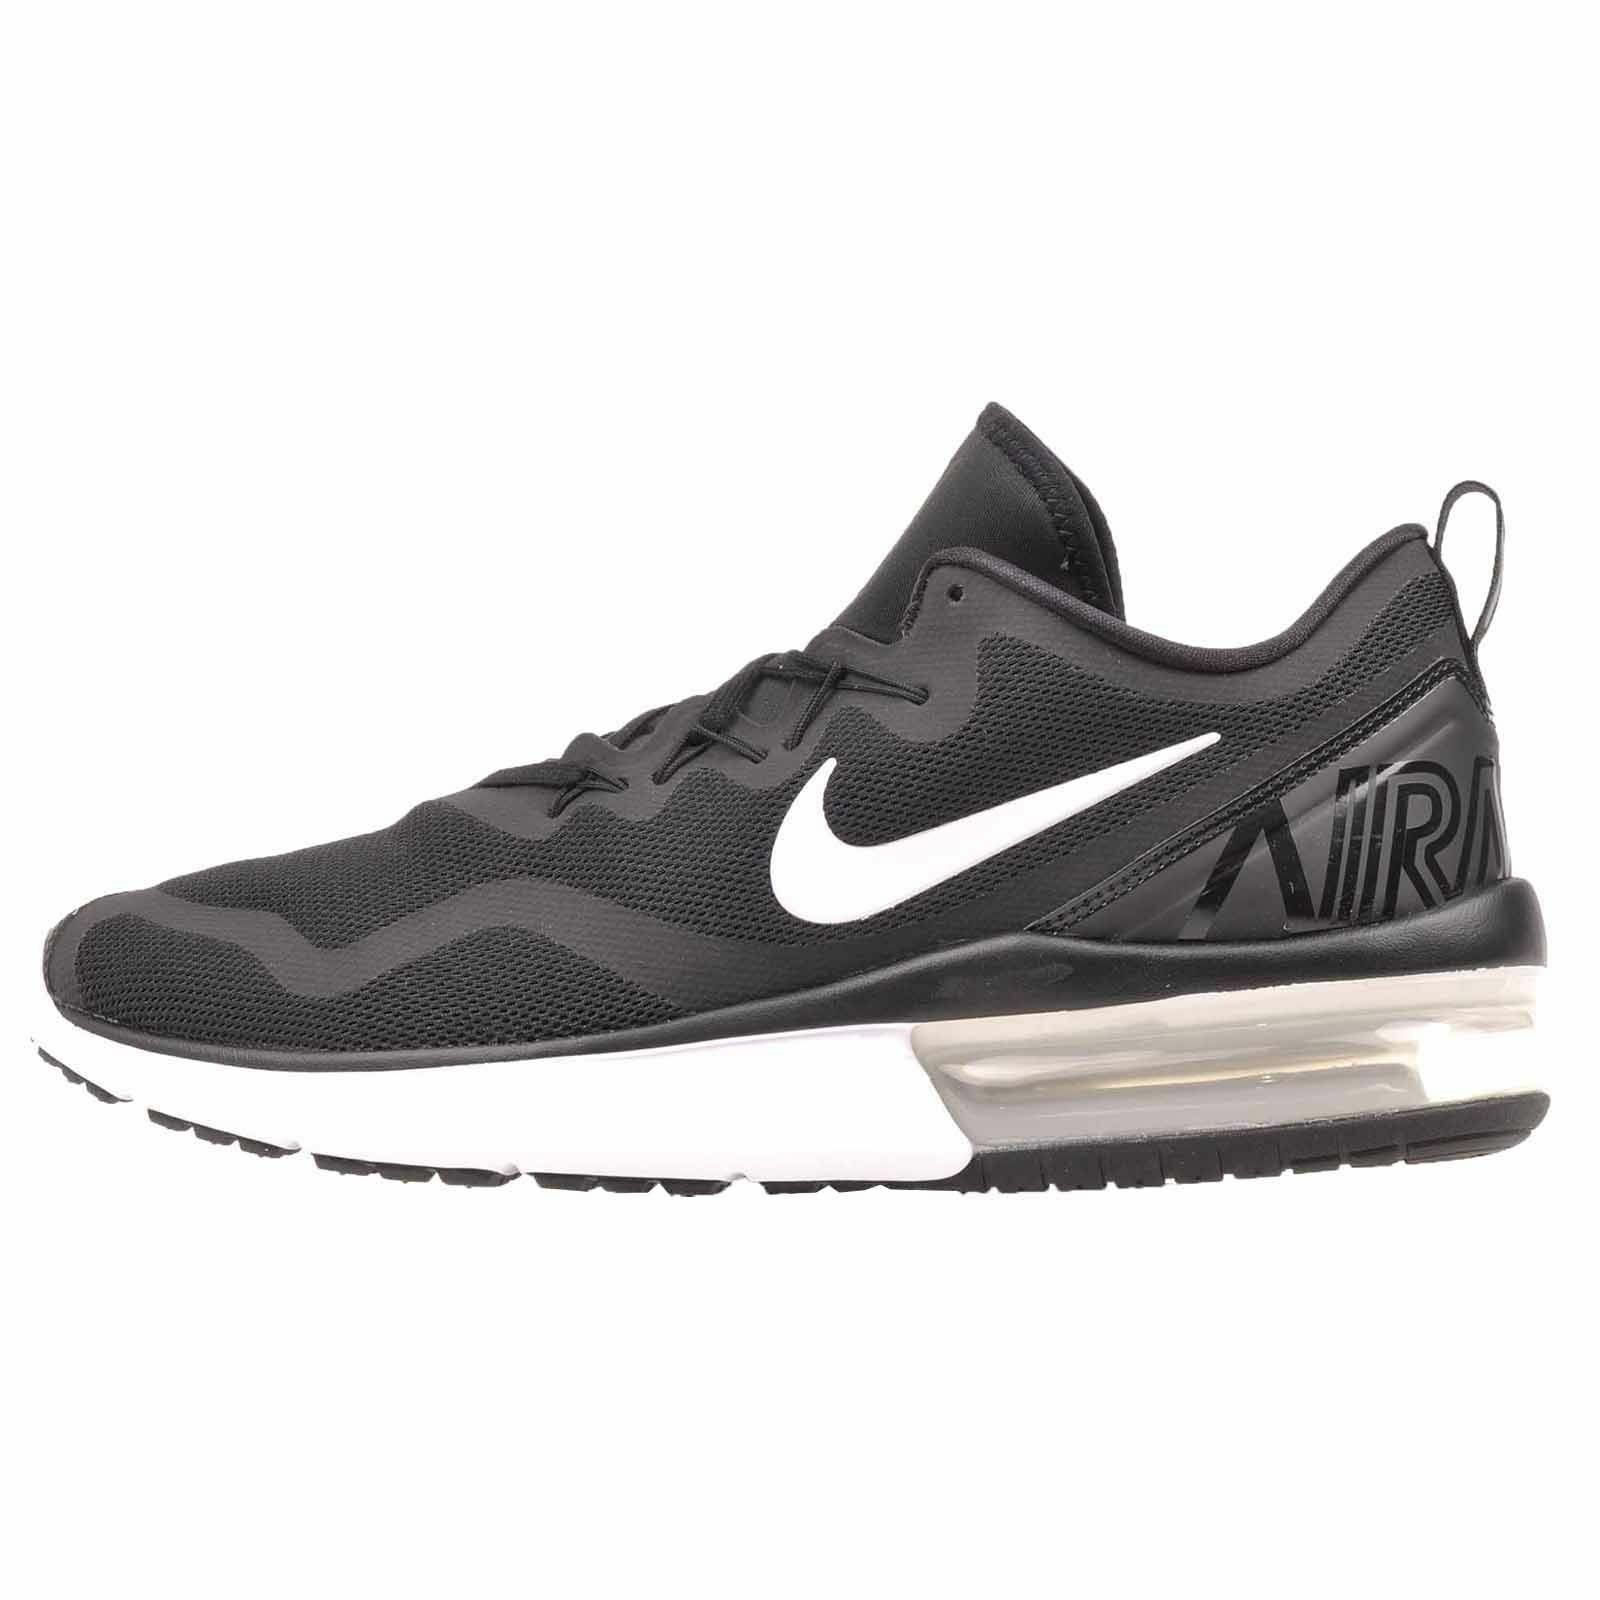 81f2de223c136 Nike Womens 7 Air Max Fury Aa5740 001 Black White Running Casual ...